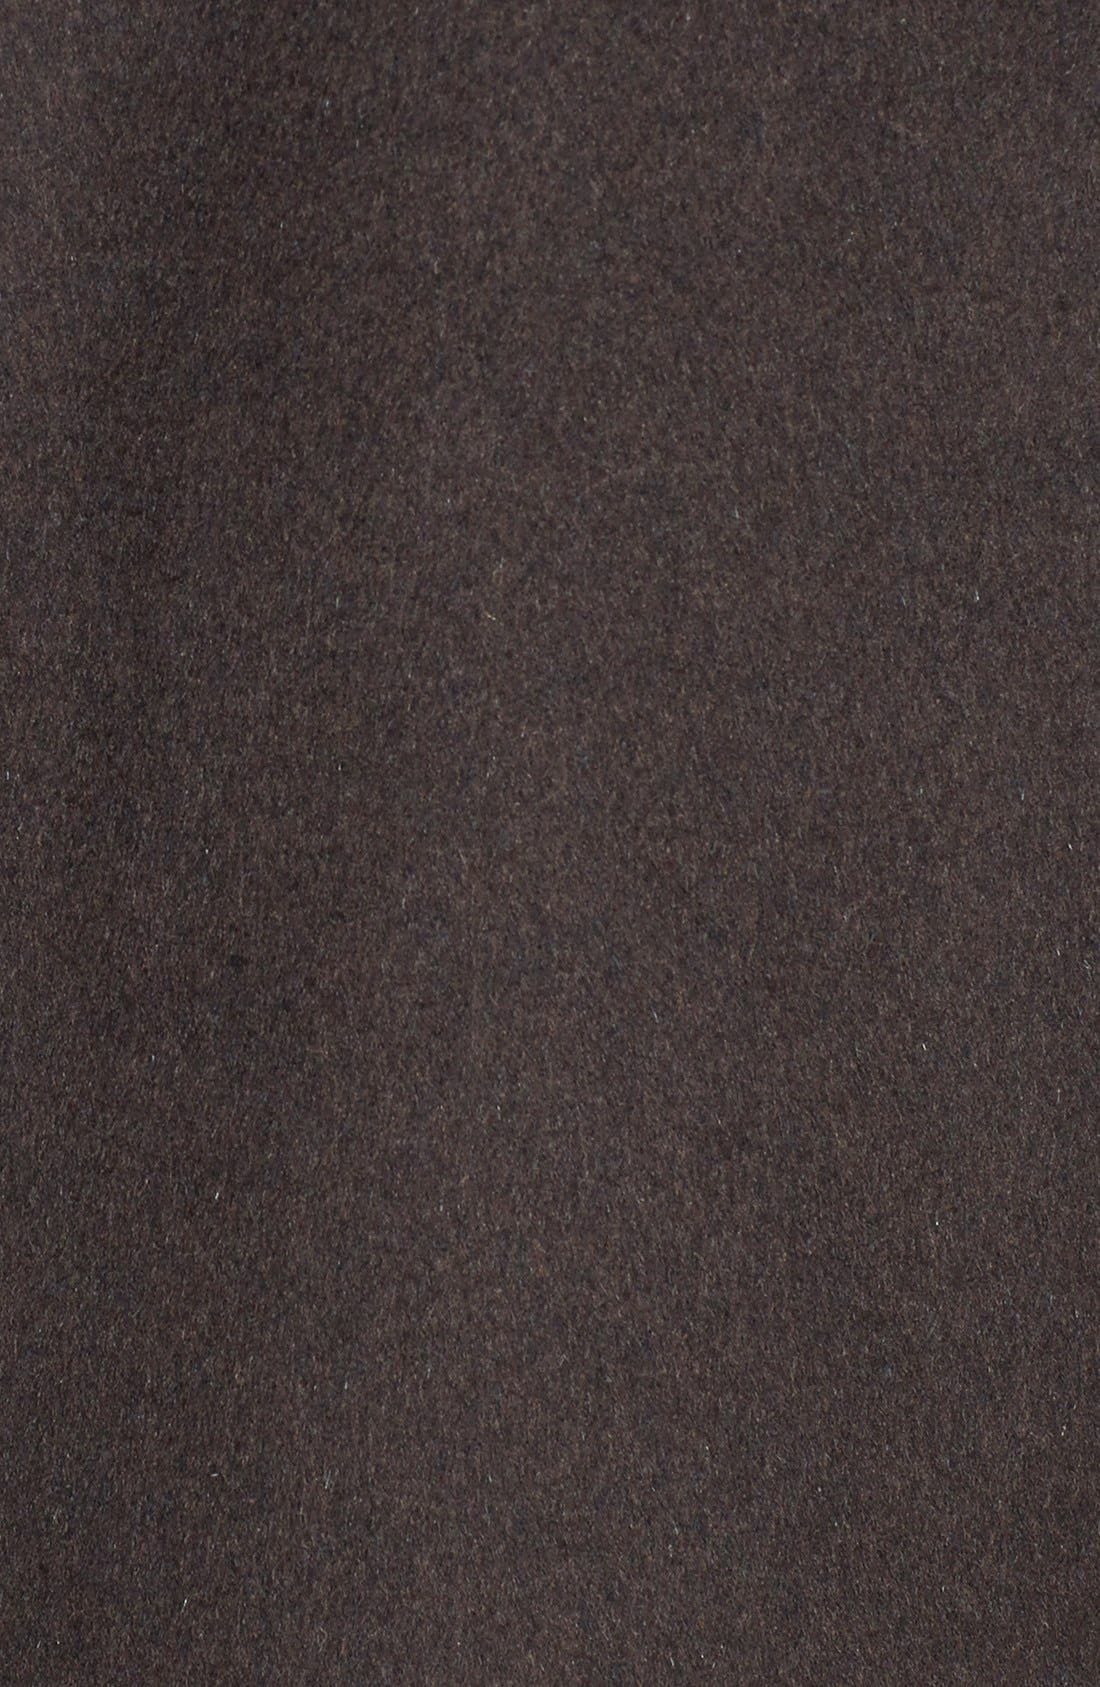 Alternate Image 3  - Ellen Tracy Funnel Collar Wool Blend Topper (Regular & Petite) (Nordstrom Exclusive)